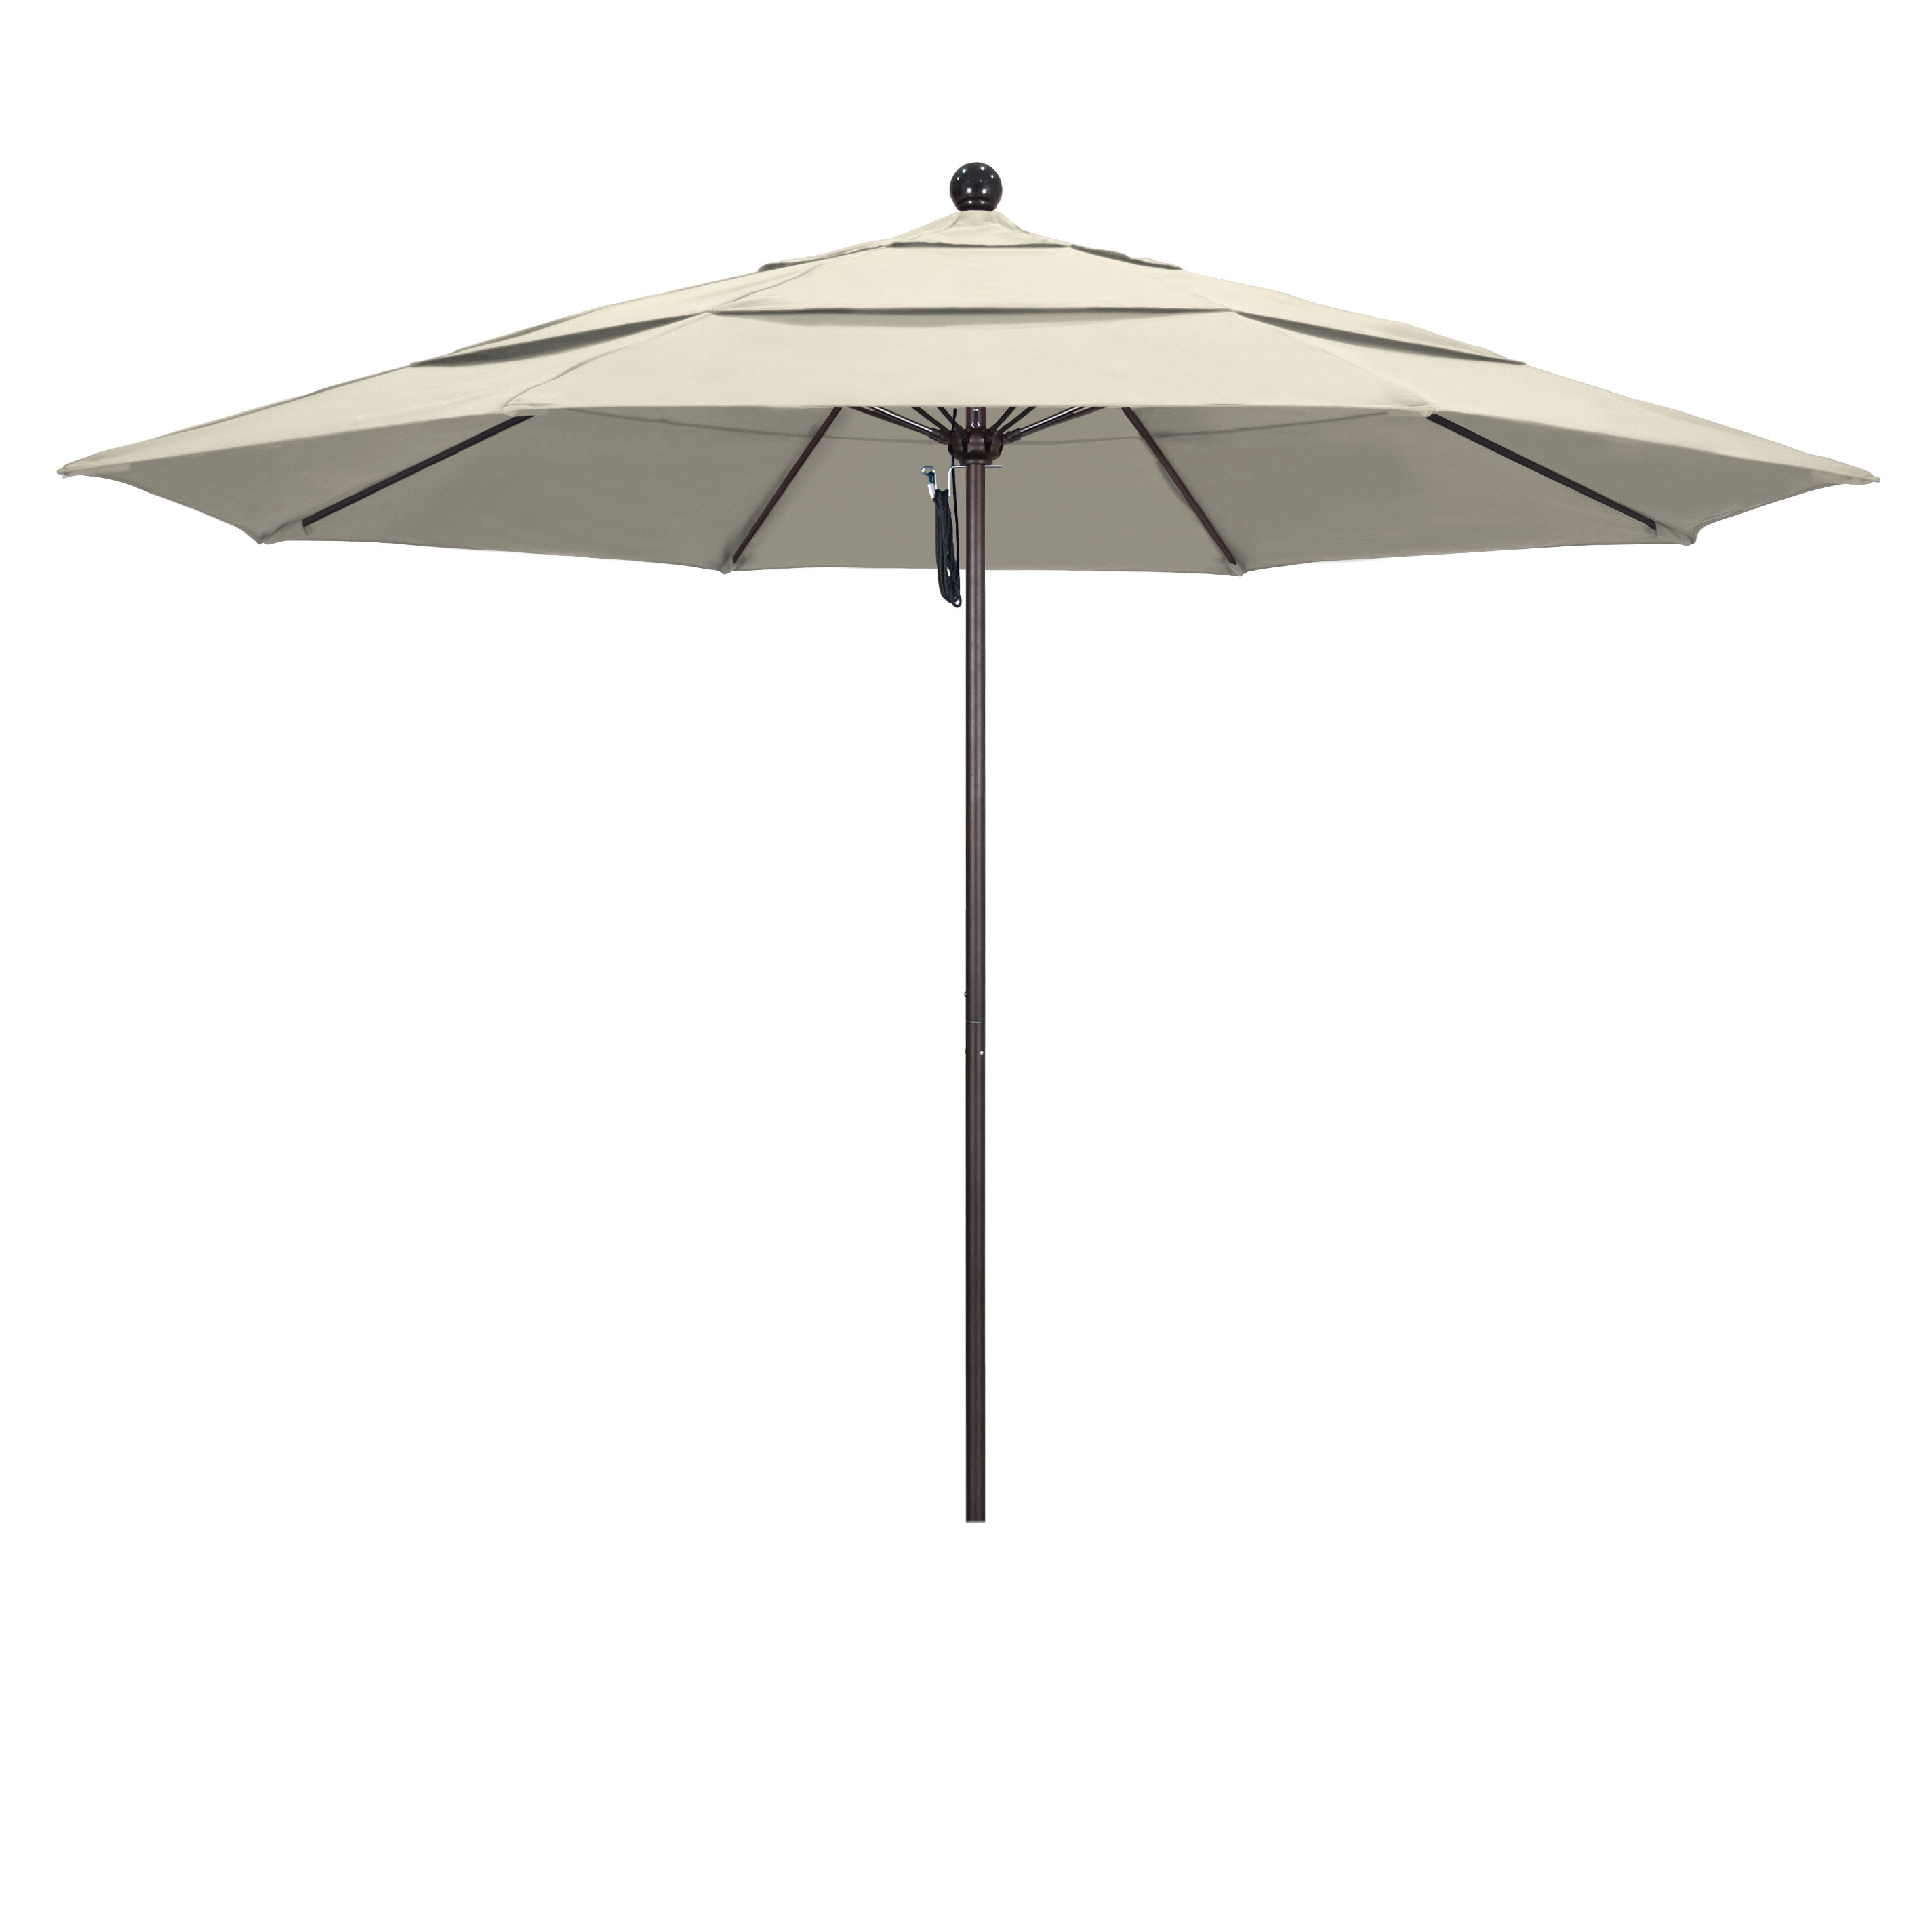 Most Up To Date Duxbury 11' Market Umbrella Pertaining To Mullaney Market Sunbrella Umbrellas (View 20 of 20)